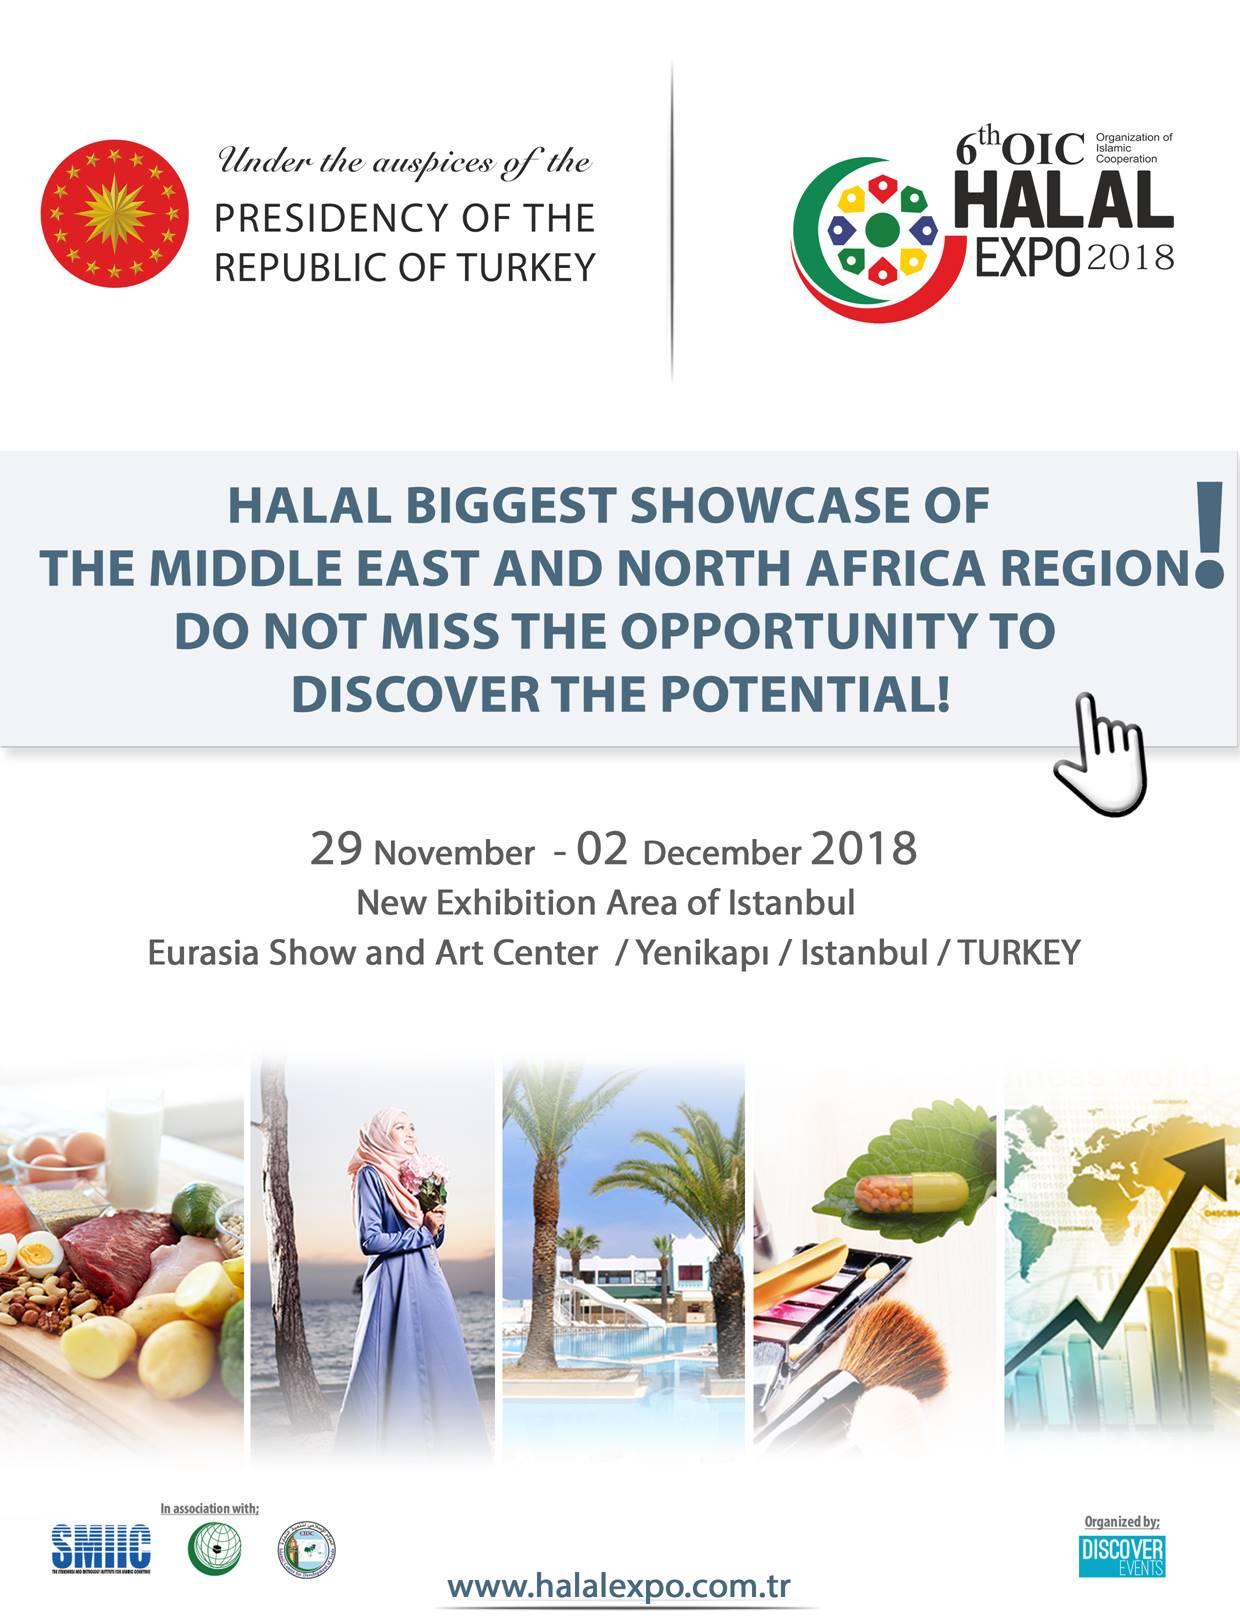 Halal Food Guidelines